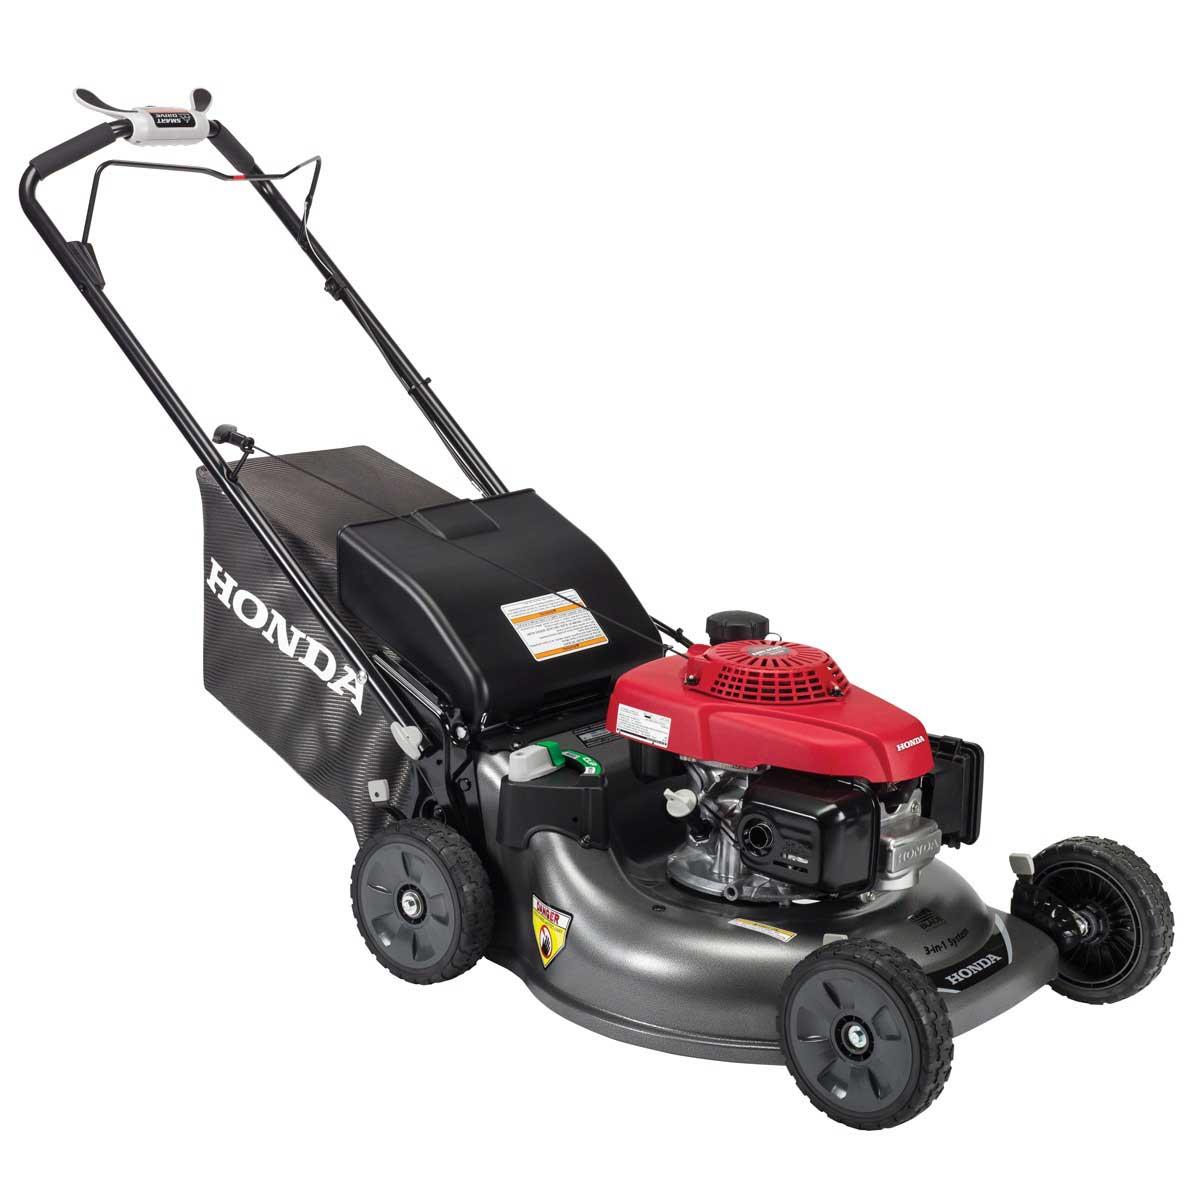 Honda Lawnmower HRR216VKA